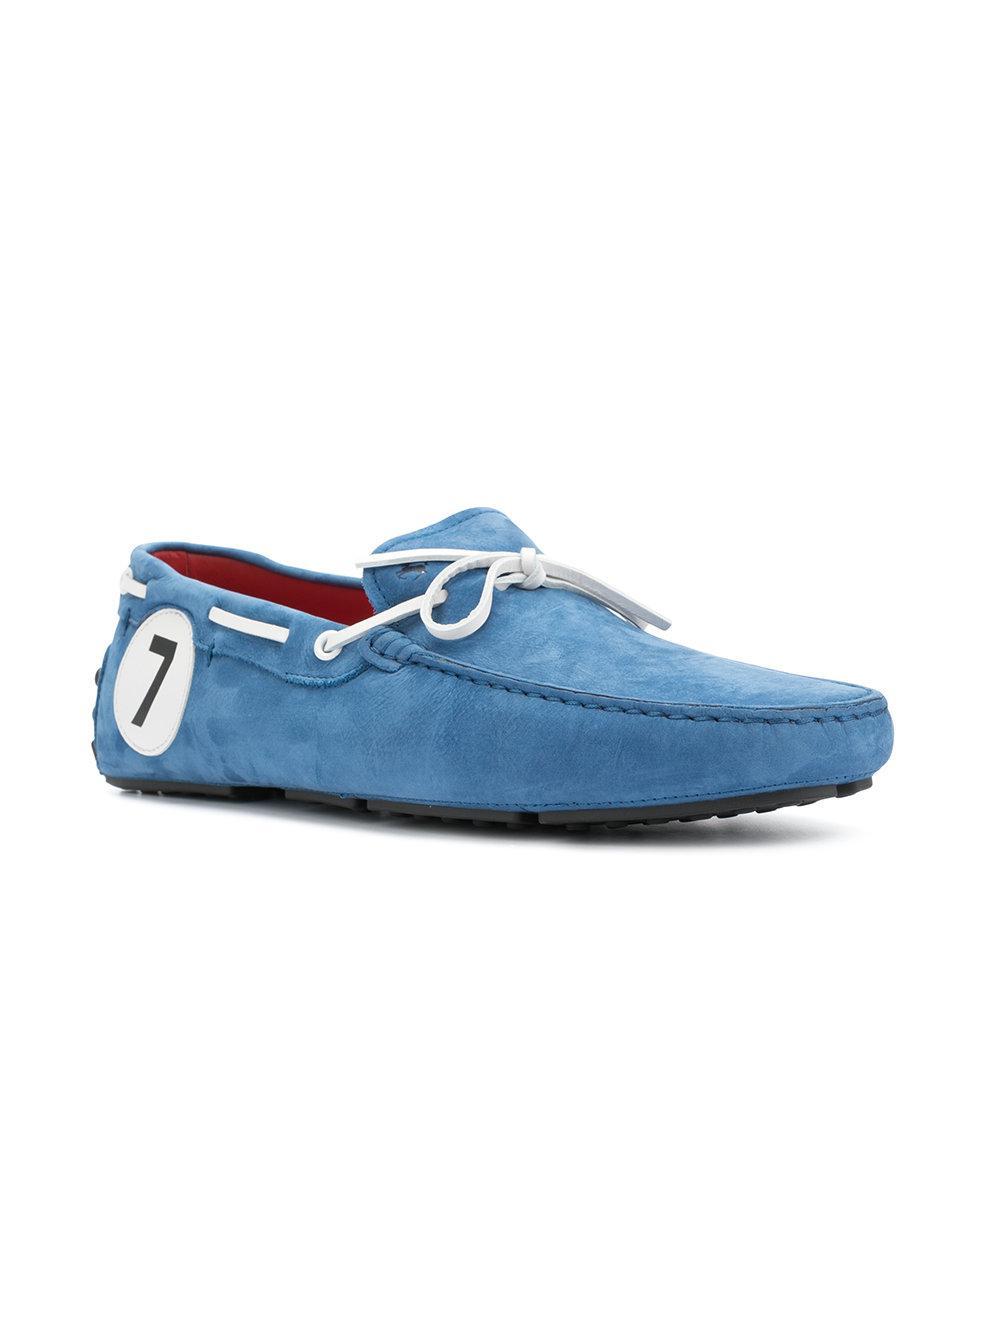 x Ferrari Gommino driving shoes - Blue Tod's rA6kUnk